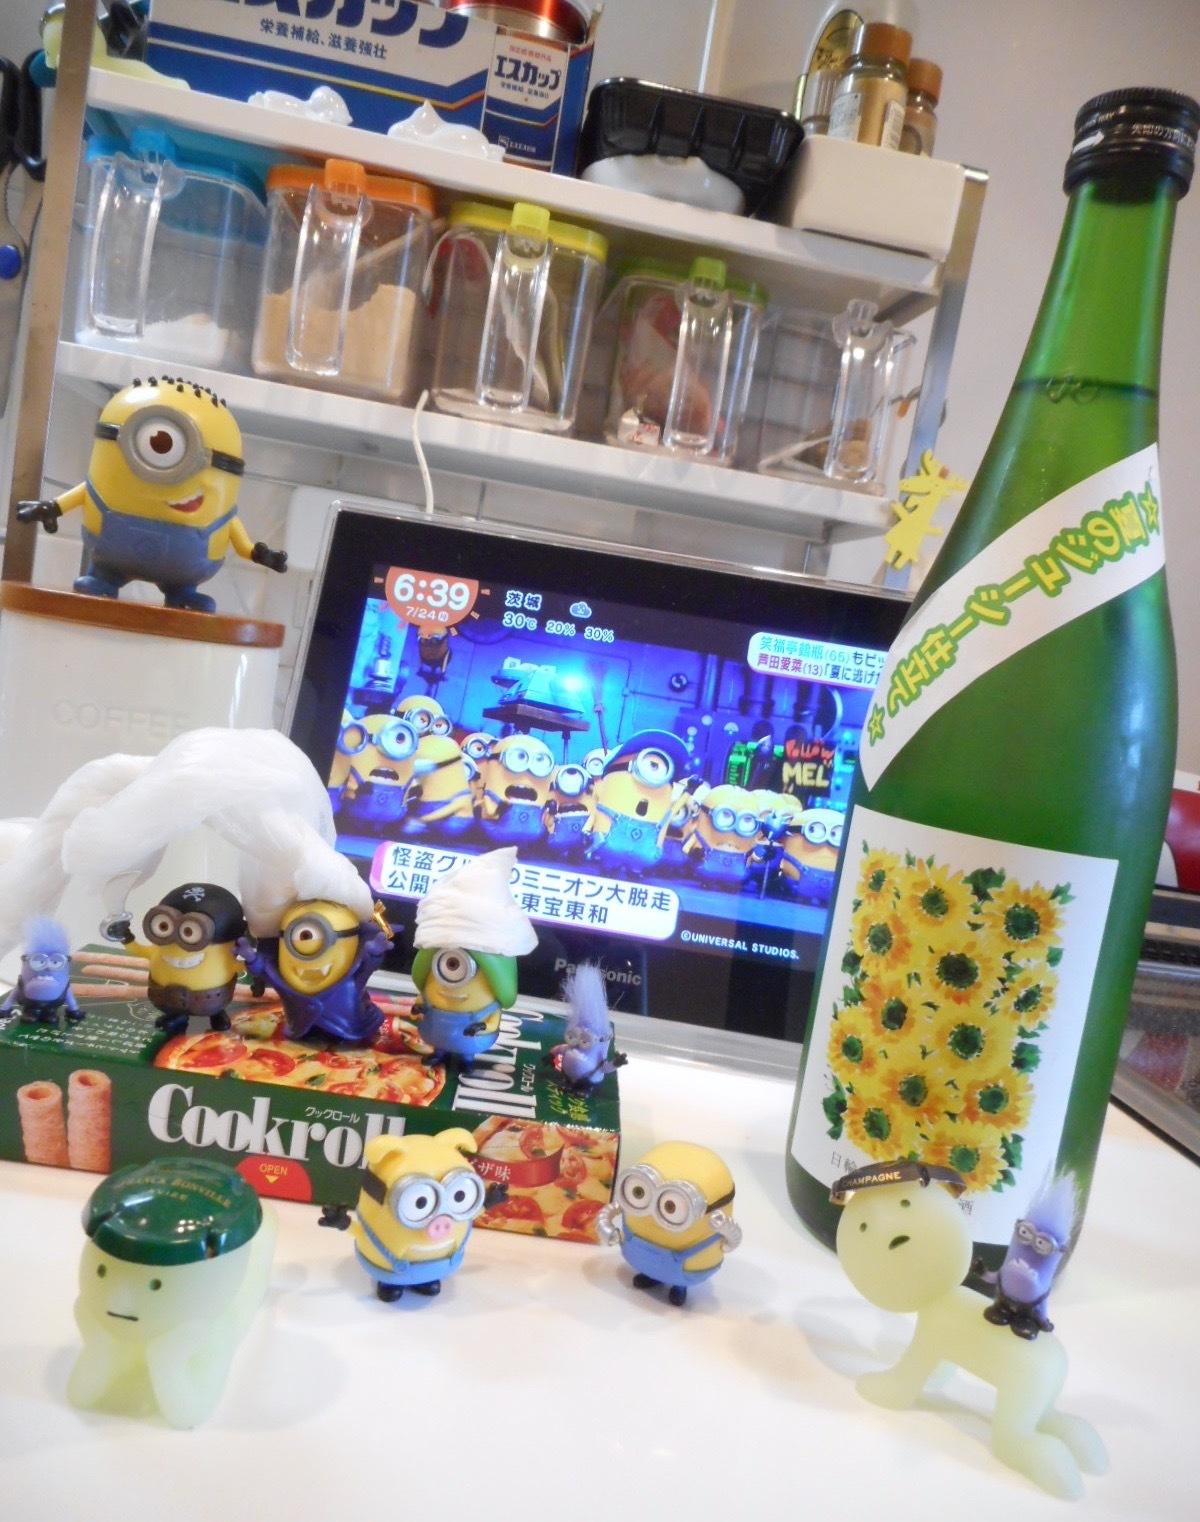 hiwata_himawari28by3.jpg